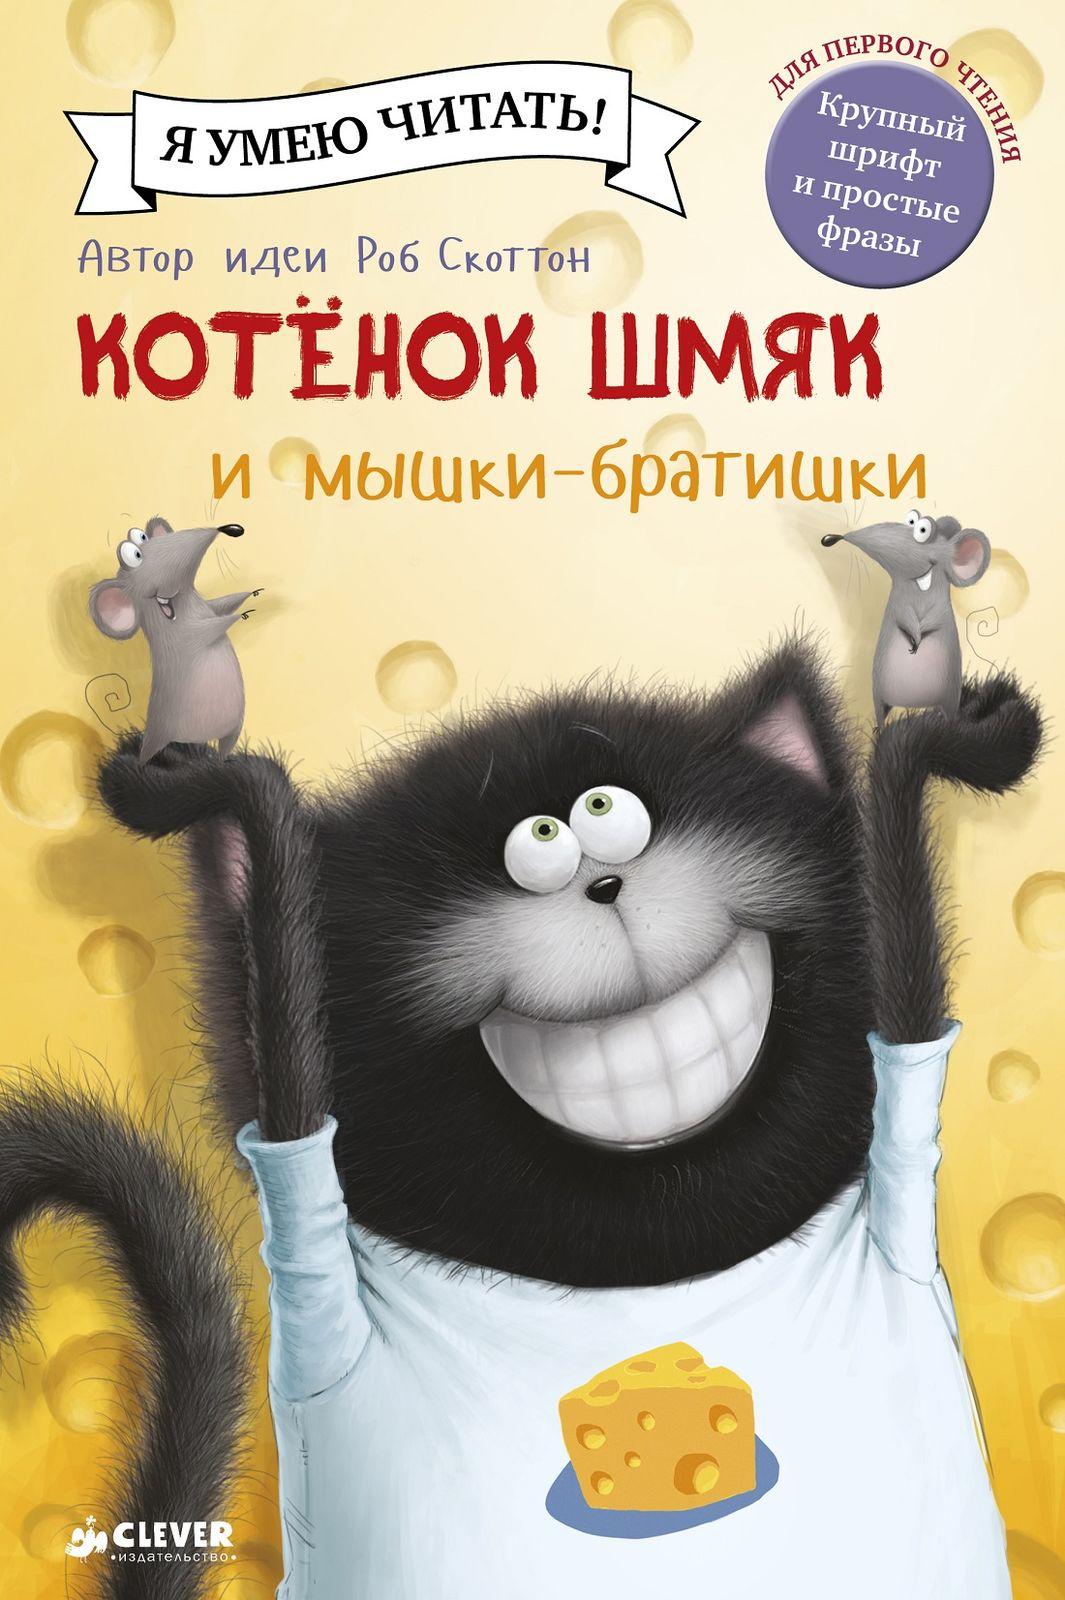 Котенок Шмяк и мышки-братишки фото